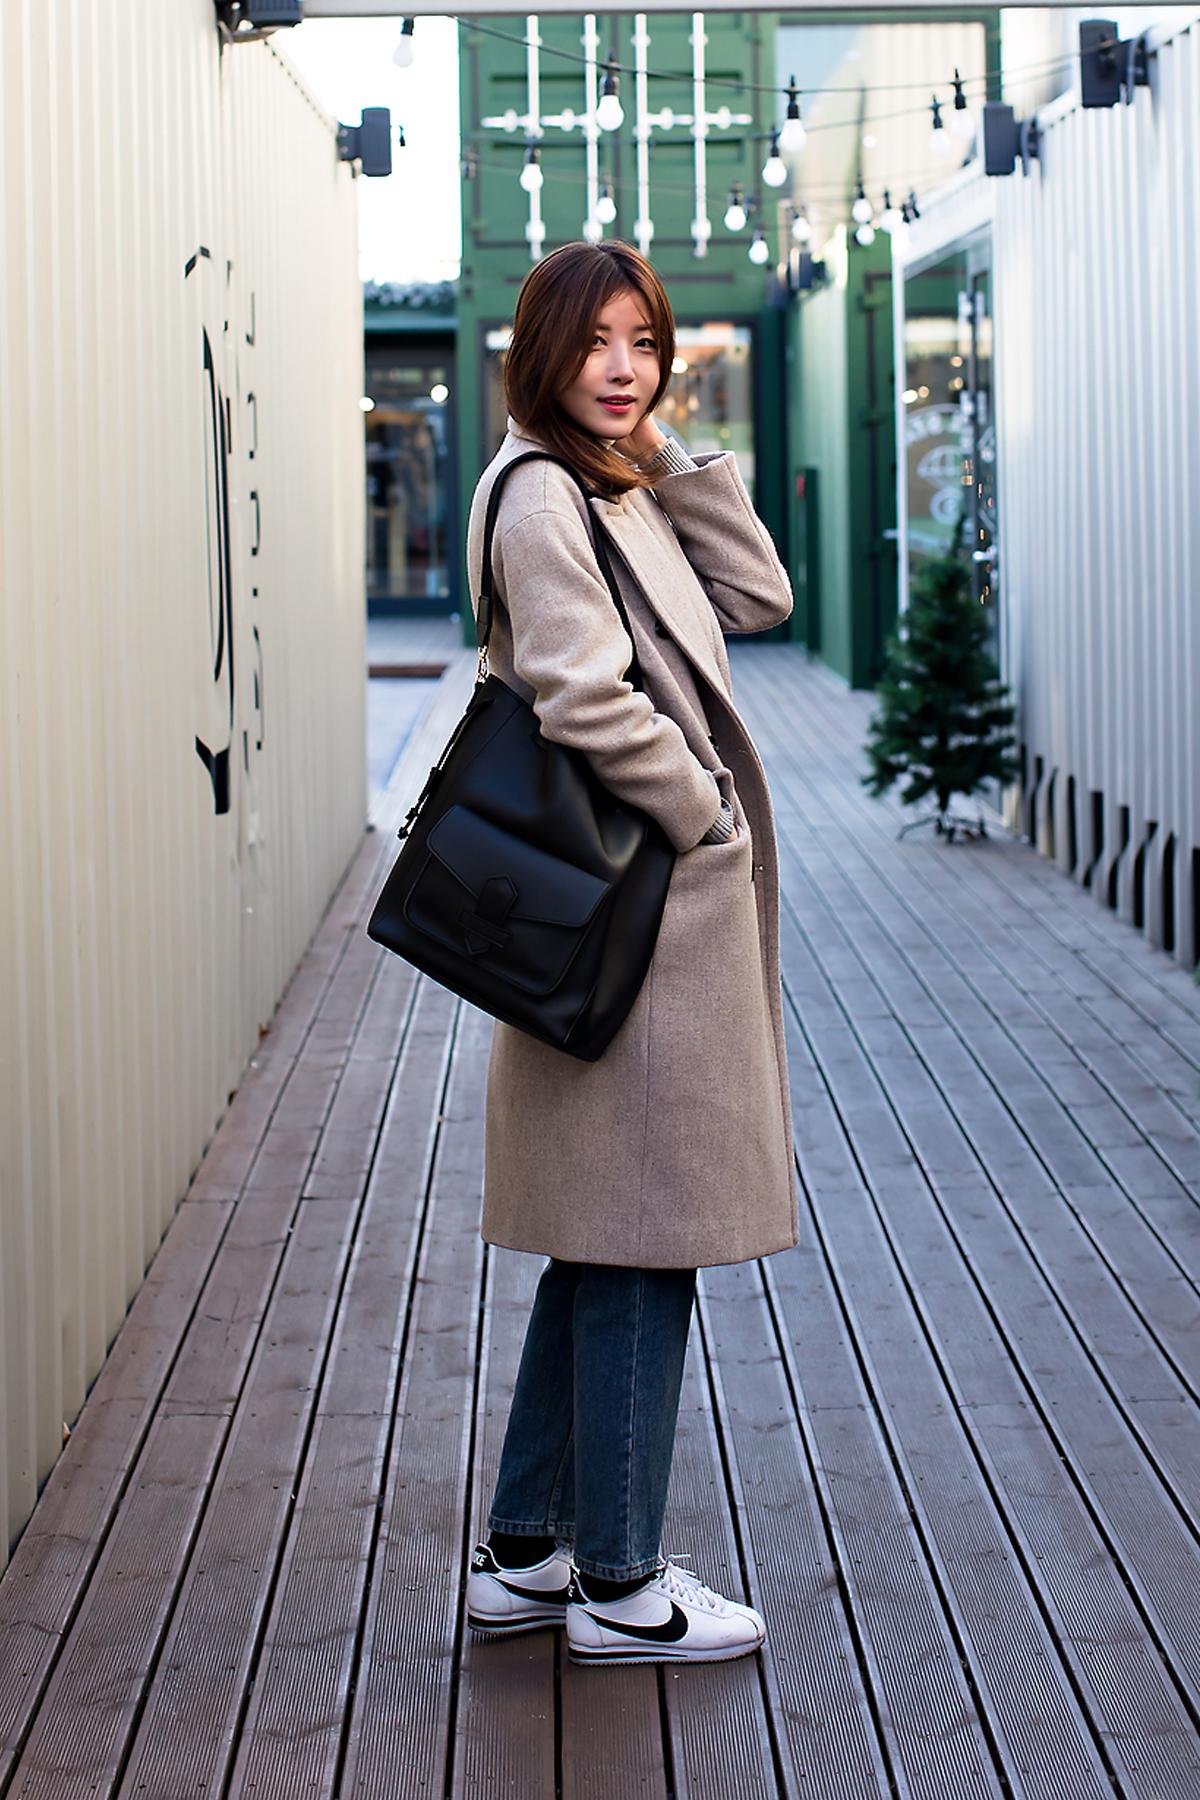 jung-wooran-street-fashion-2017-in-seoul